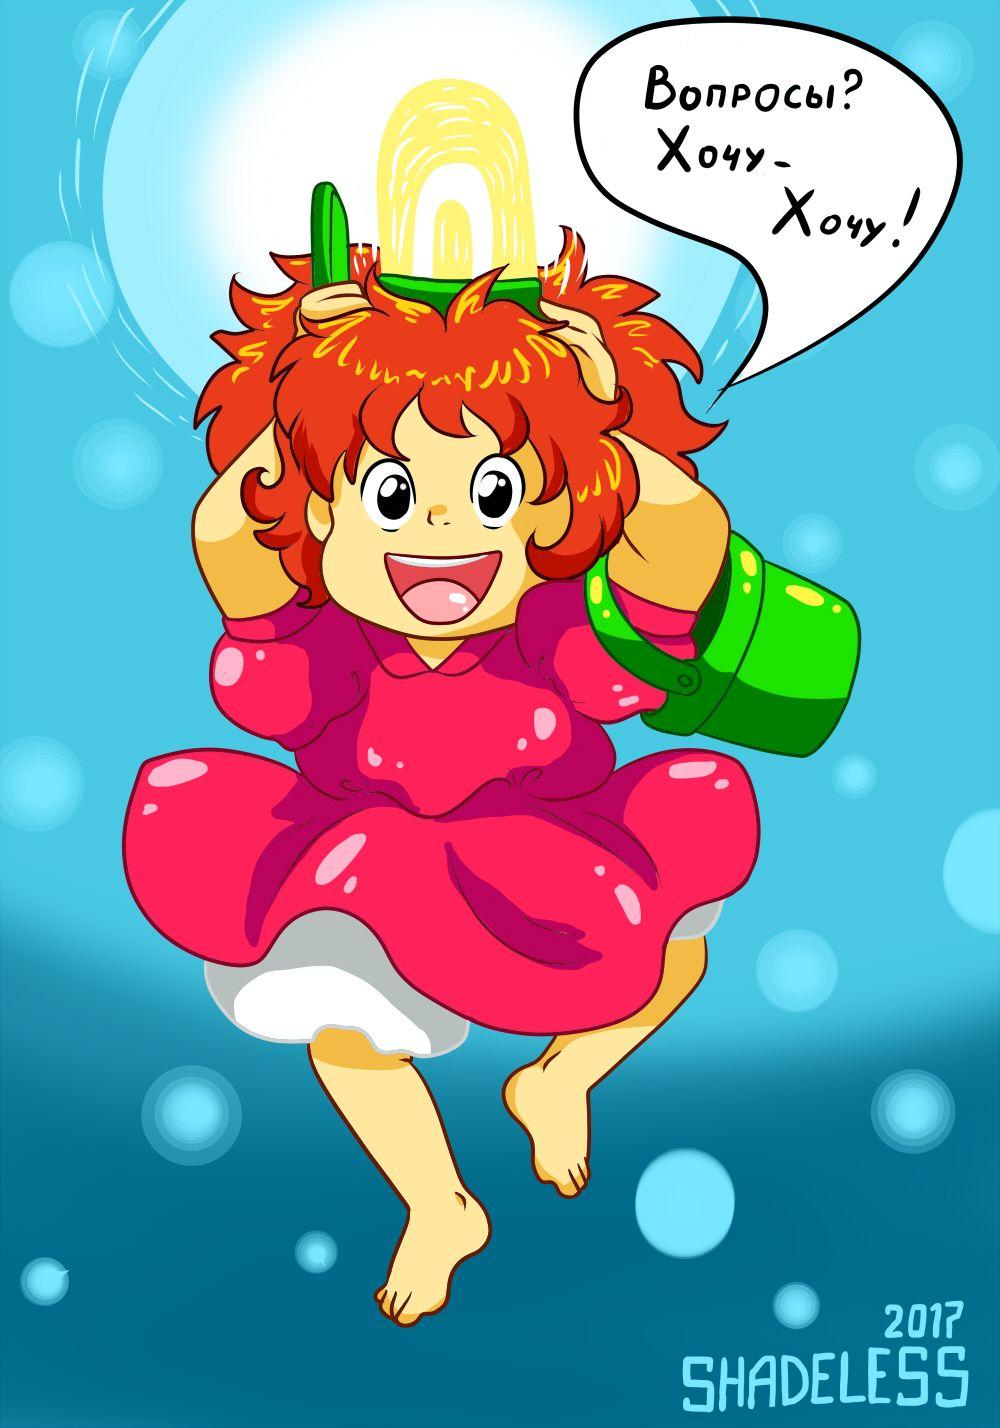 Studio_Ghibli Ponyo anime Ghiblie